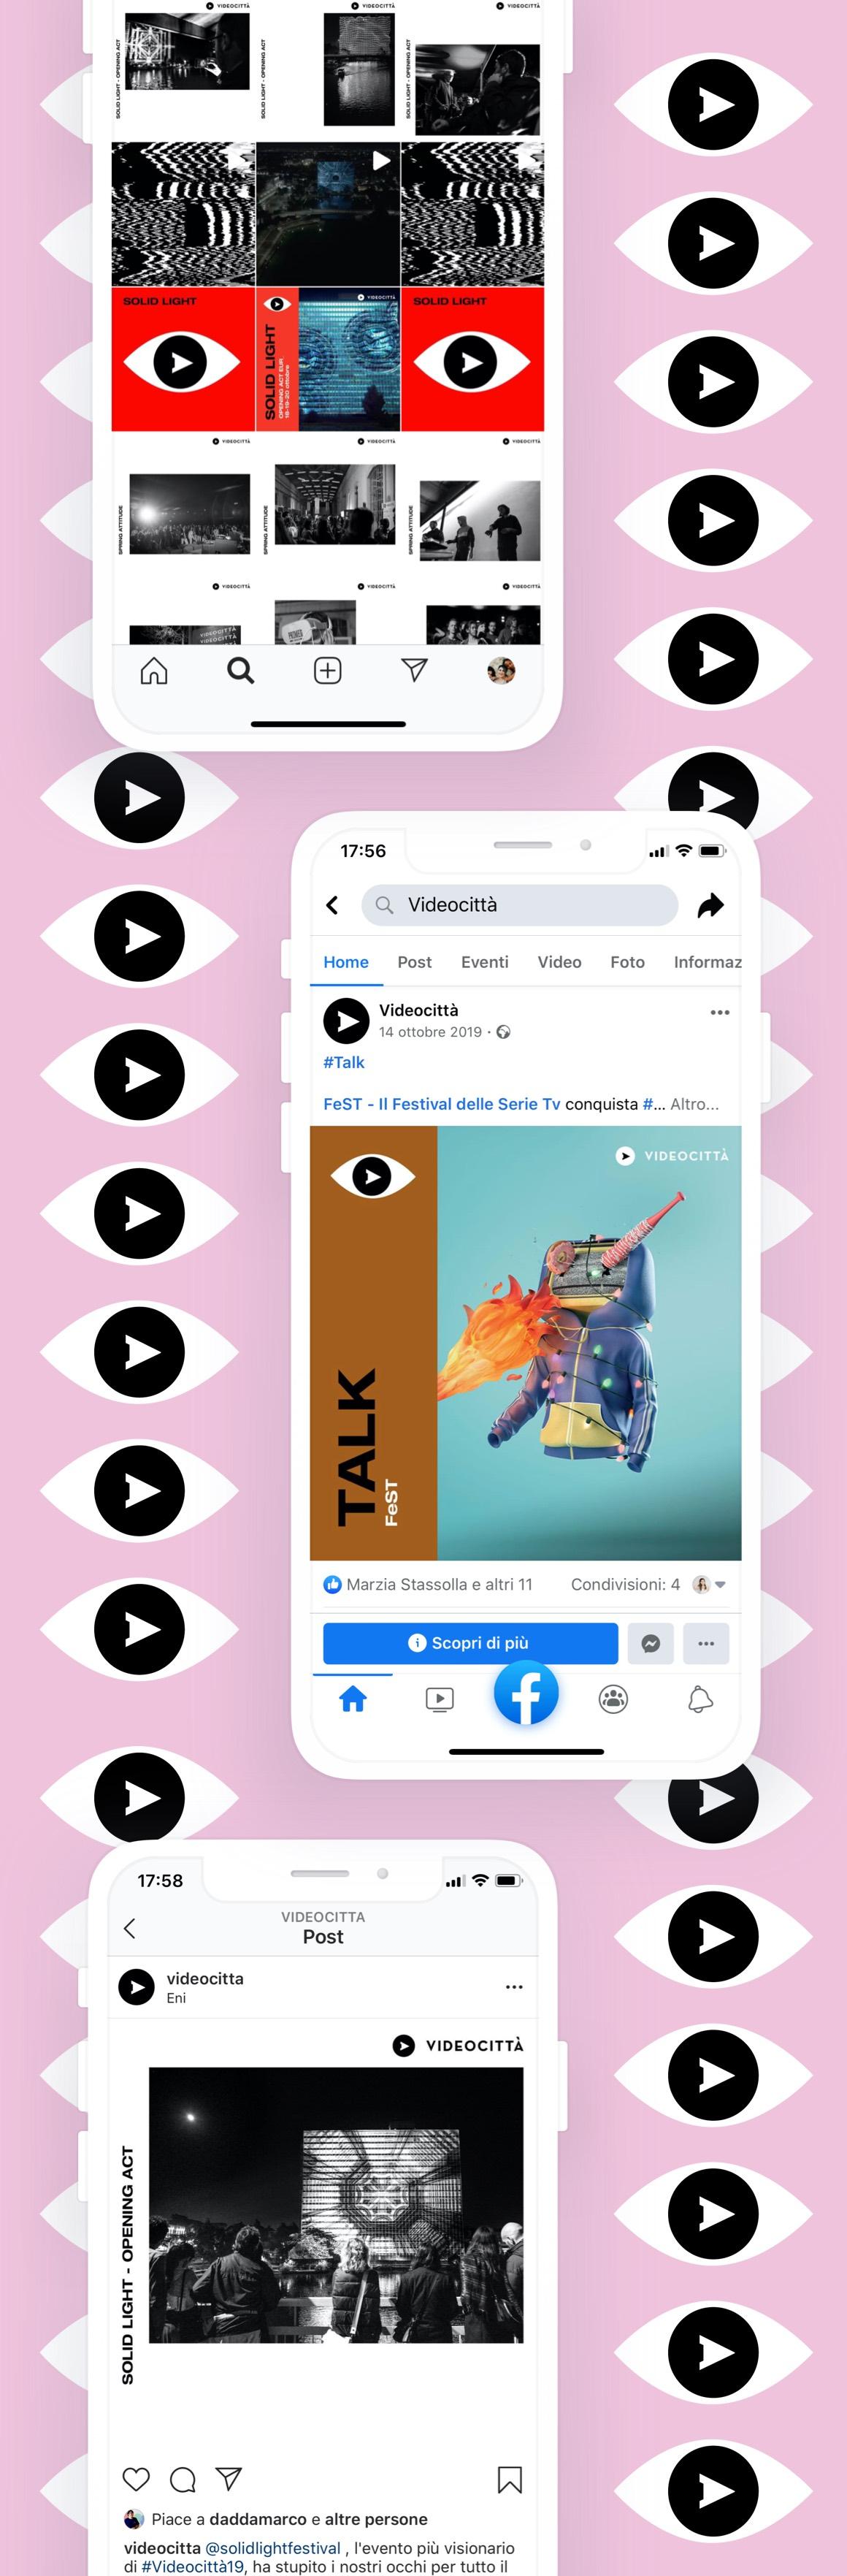 videocittà mockup iphone post social media mobile